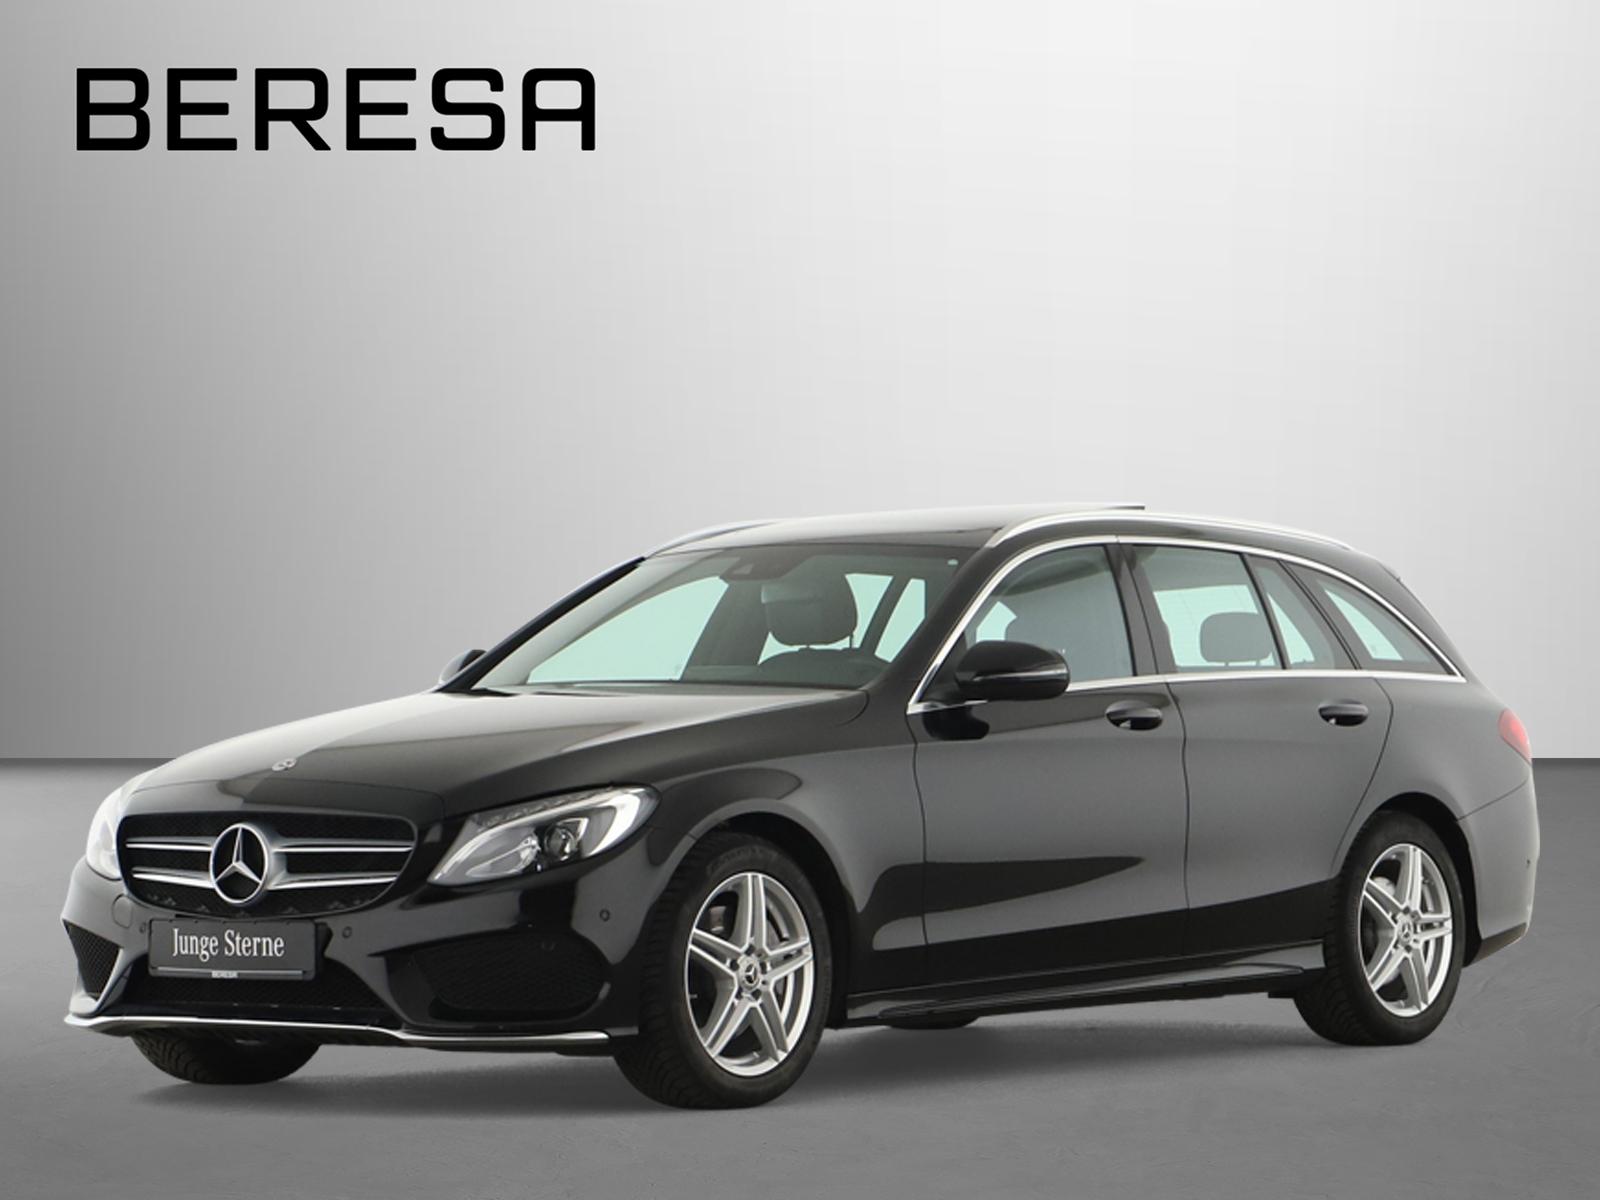 Mercedes-Benz C 200 T AMG Comand Pano.-Dach LED PDC, Jahr 2017, Benzin